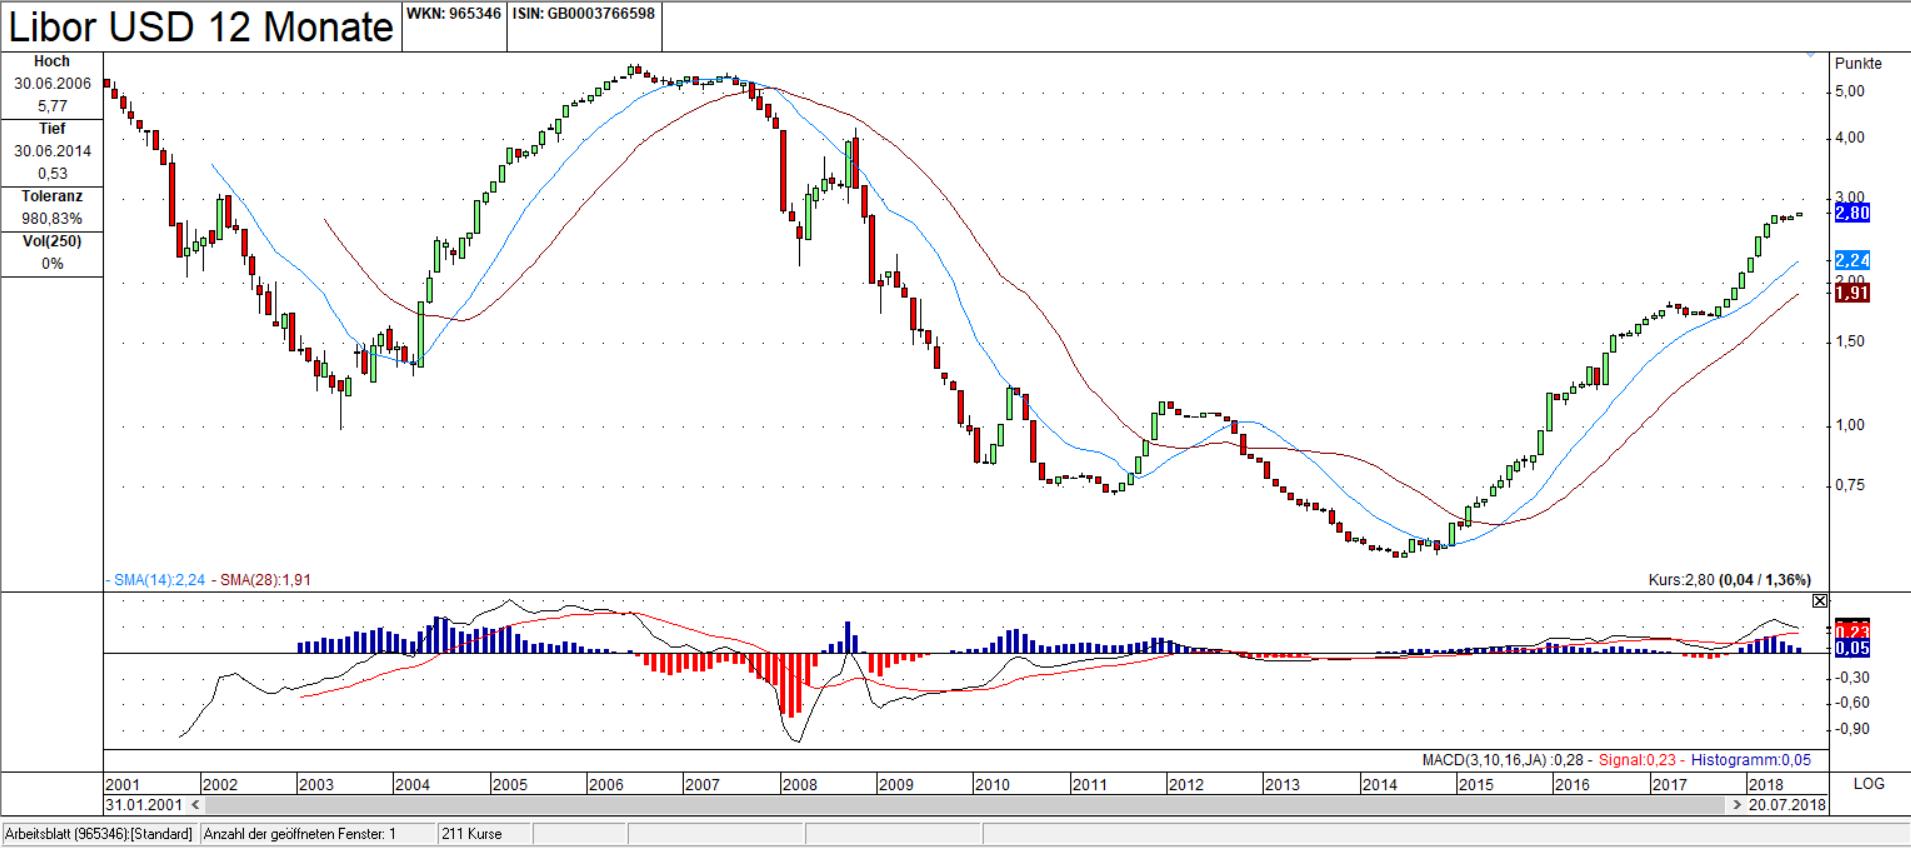 Libor USD 12M Candle Monats Chart